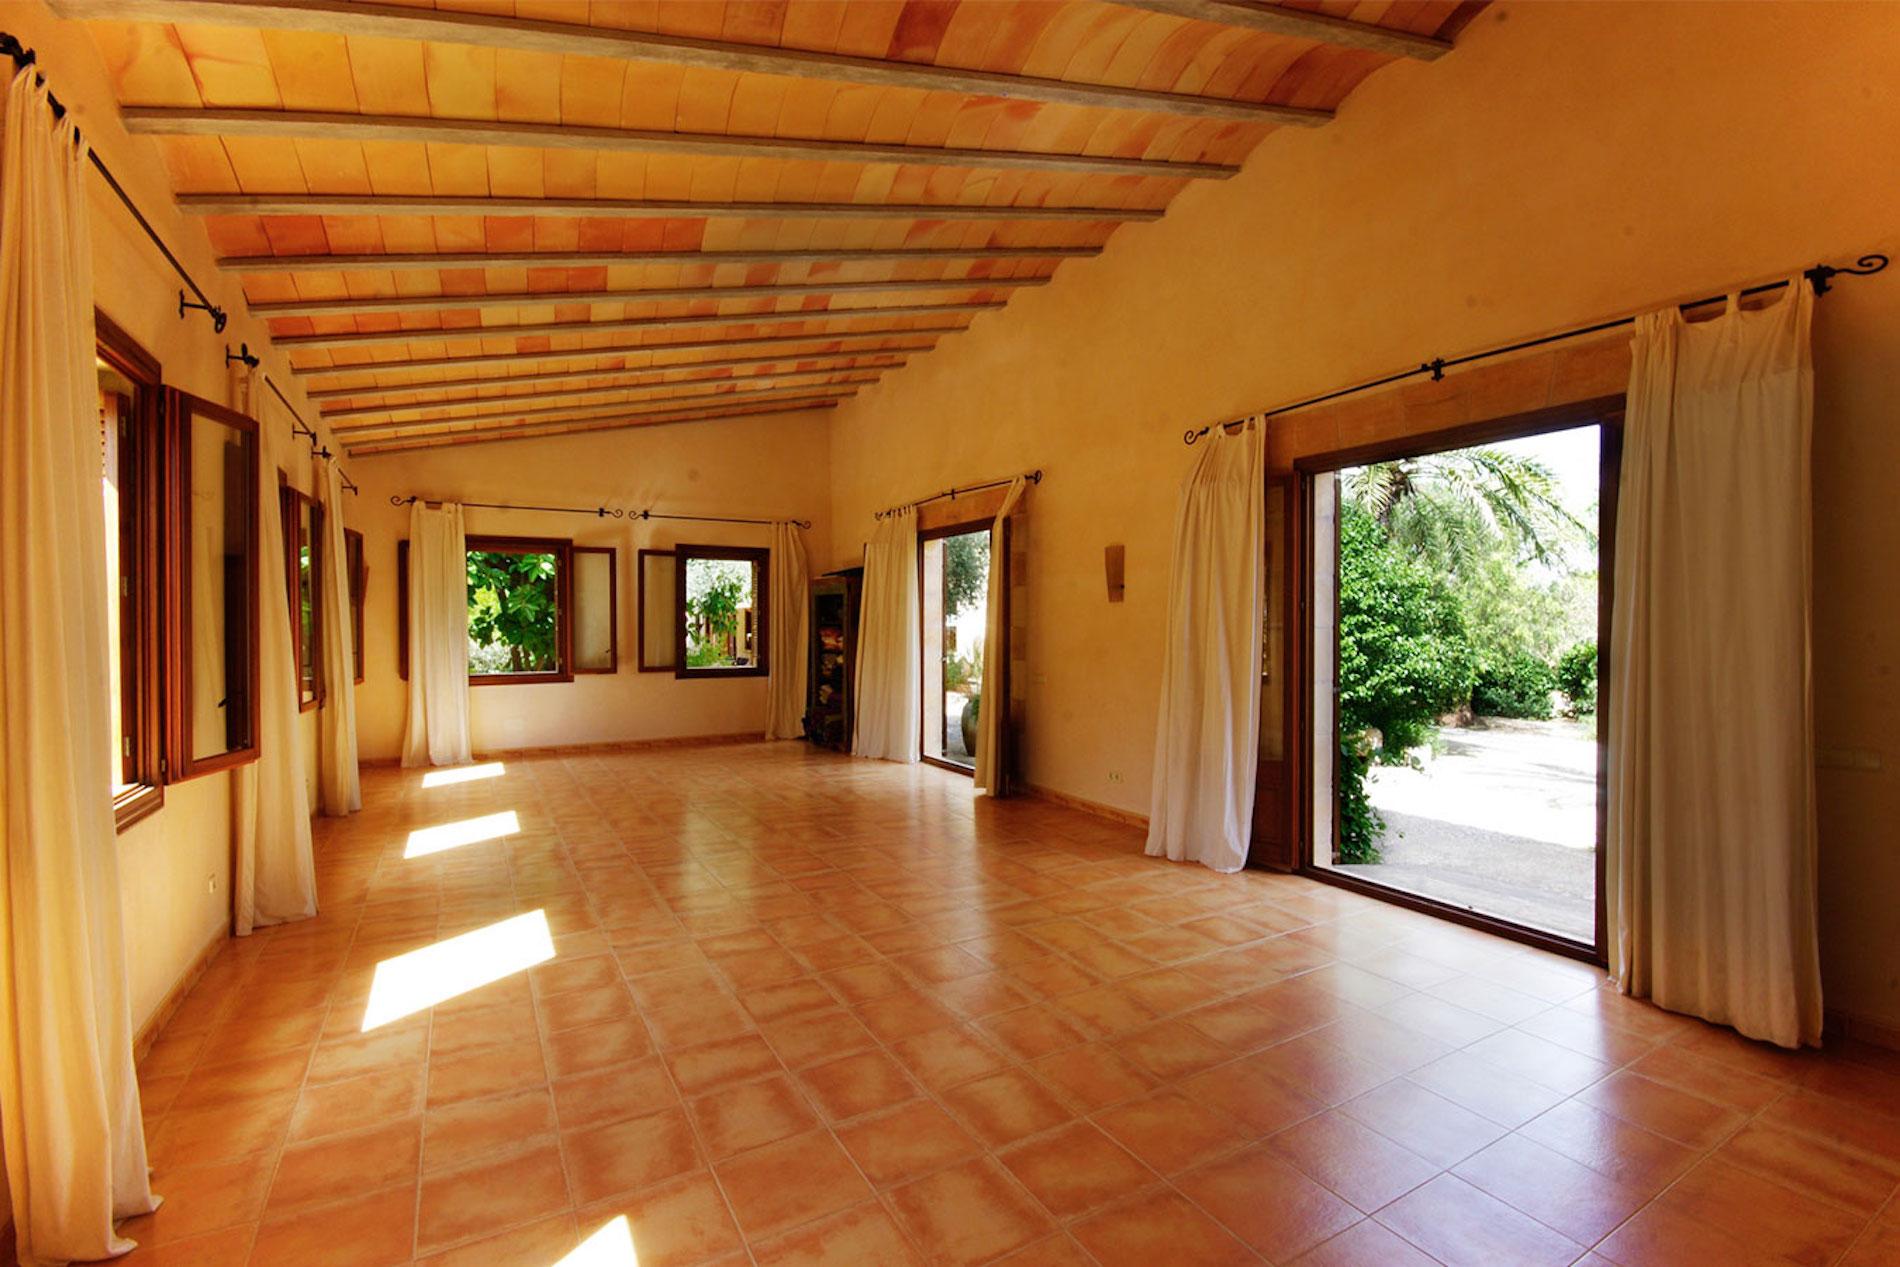 Sanau yoga retreat in mallorca finca rental for yoga groups in mallorca for Rent a center living room groups